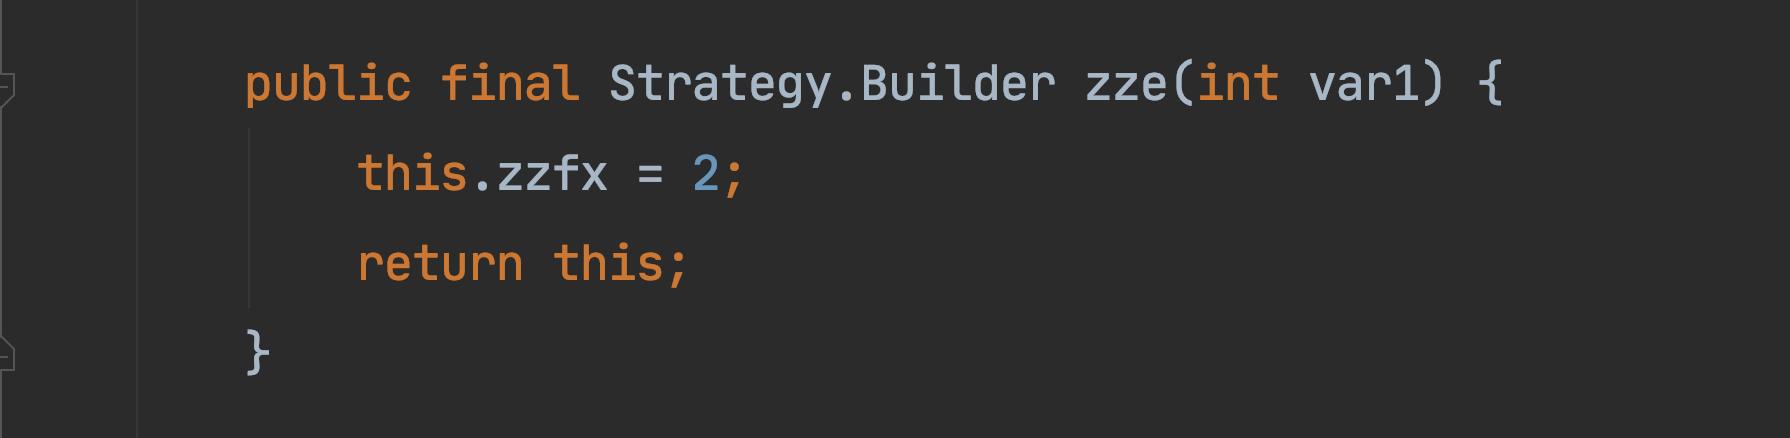 medium_builder.png